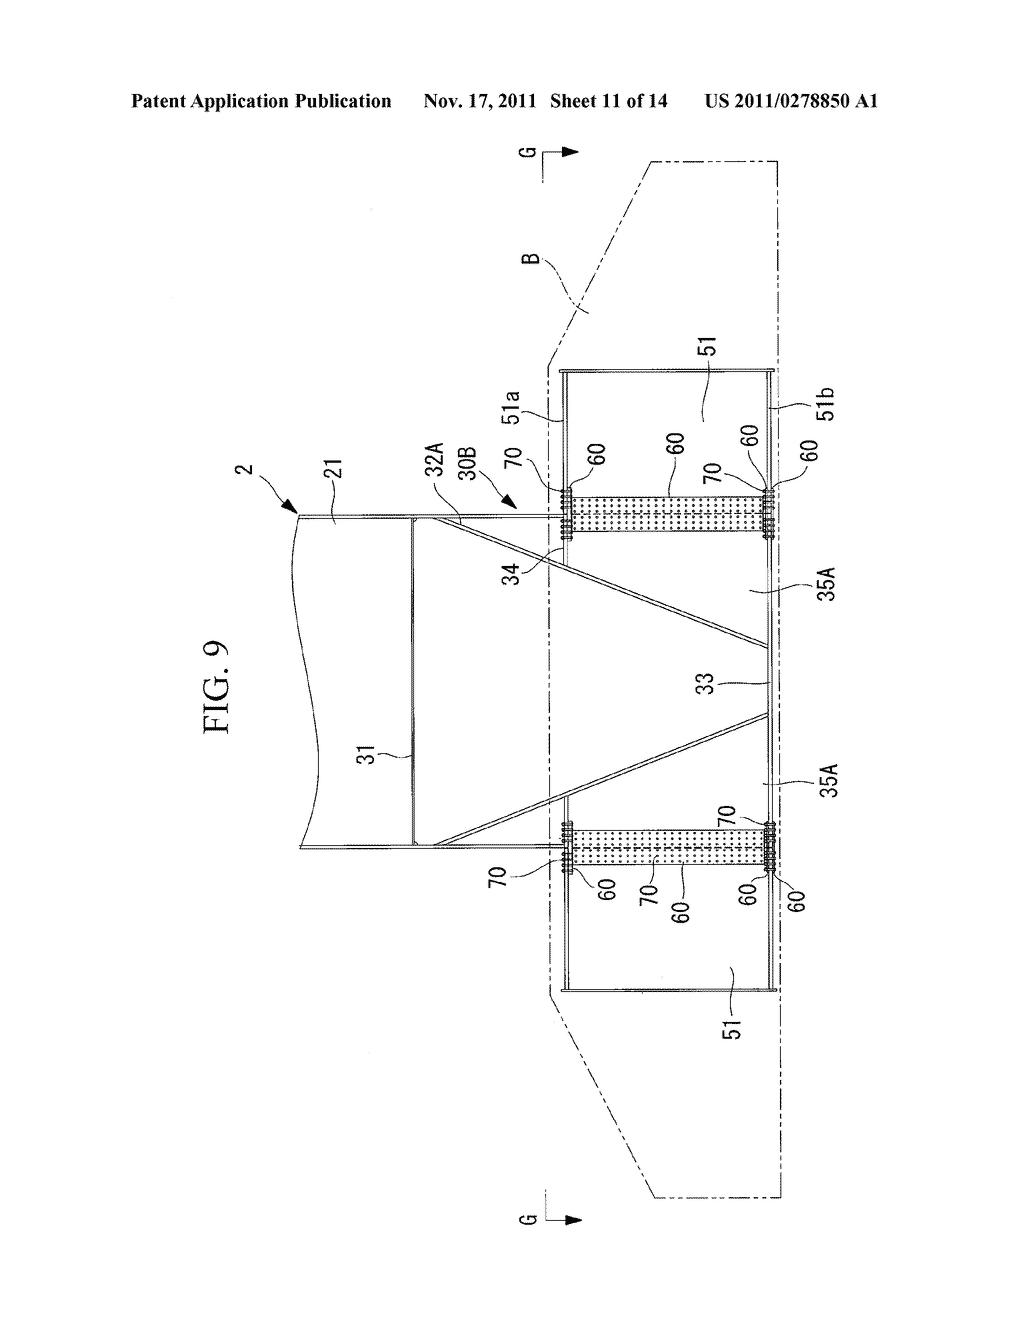 Monopole Tower And Wind Turbine Generator Having Diagram Schematic Image 12